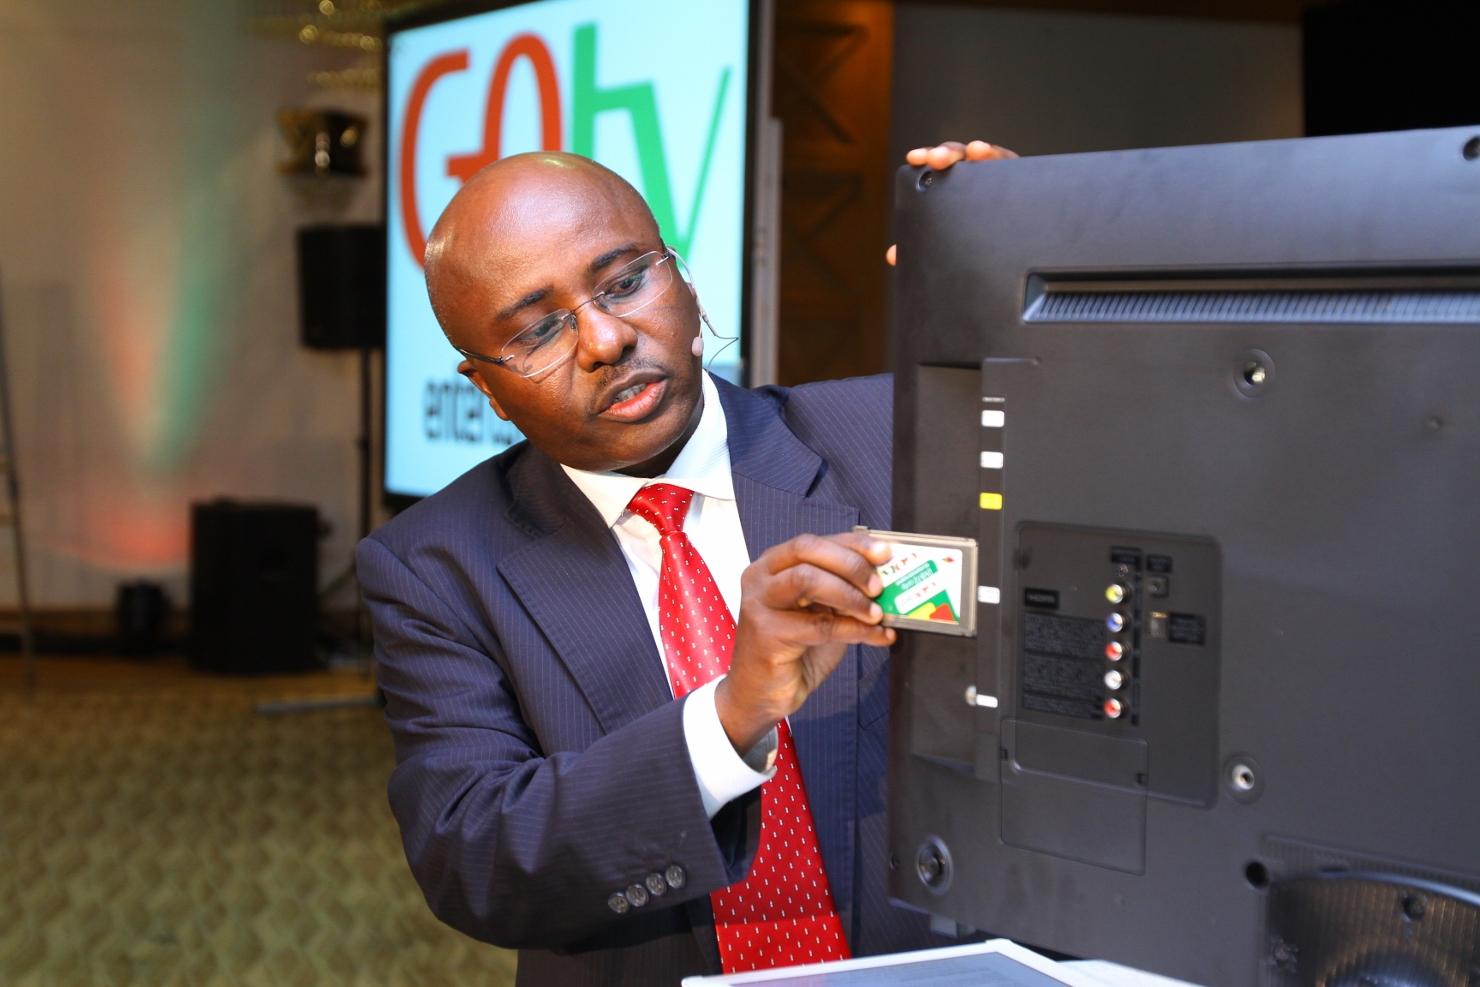 GOtv Unveils GOcard In Kenya - TechMoran